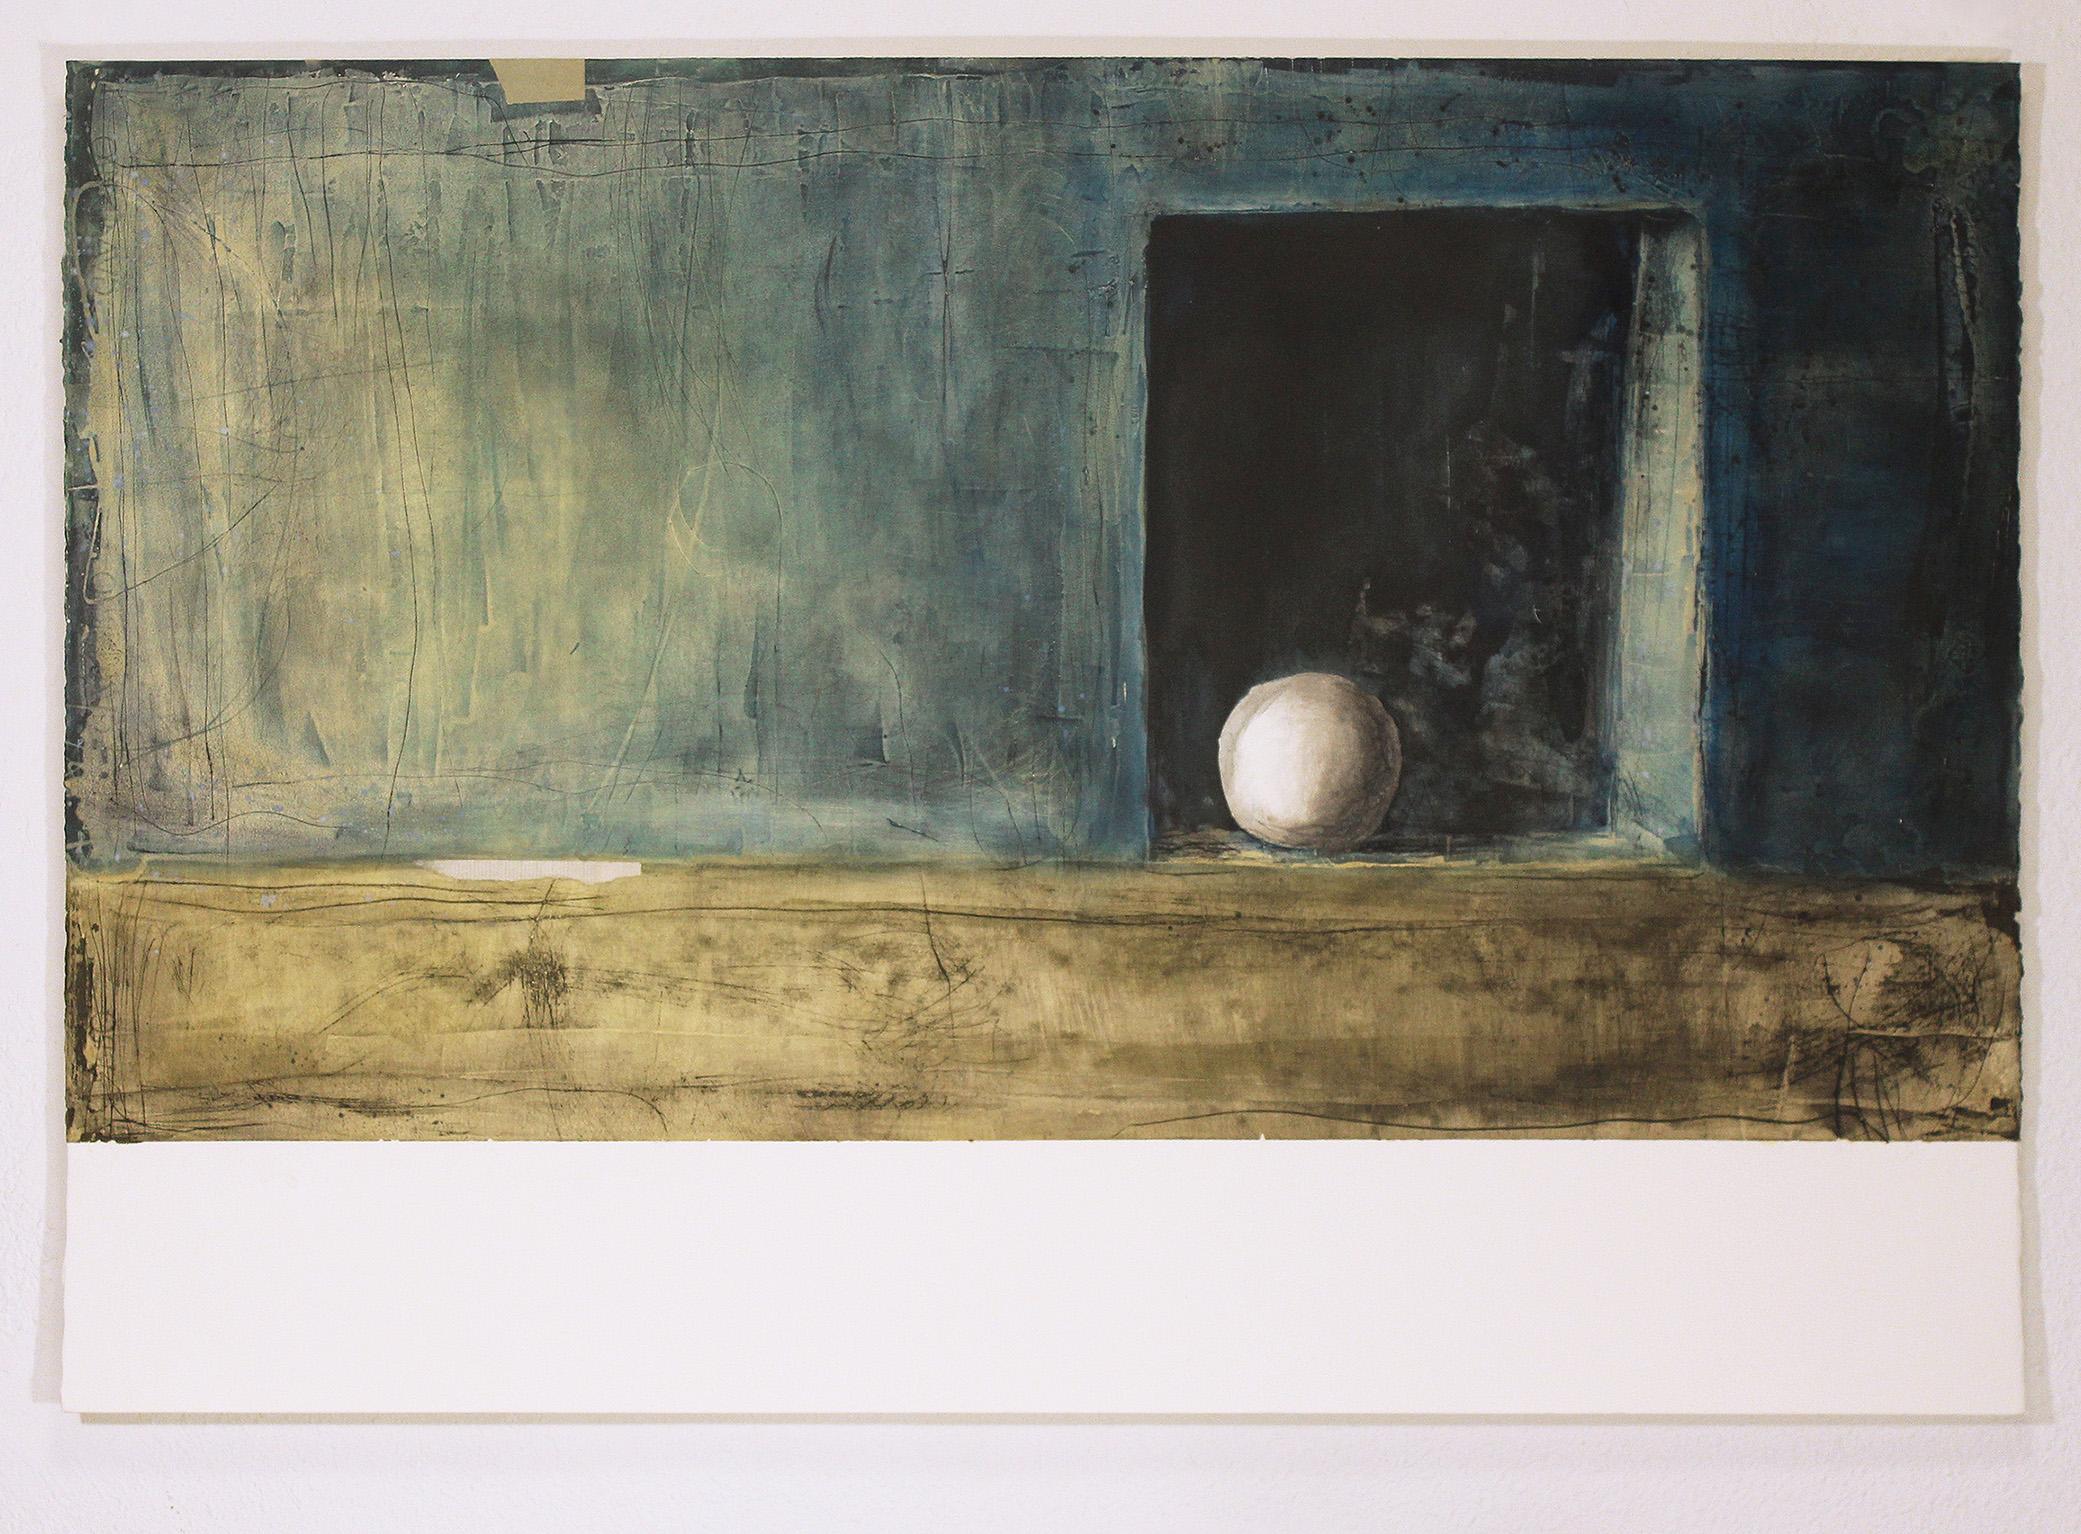 Homenatge a Toni Catany III. Mur blau